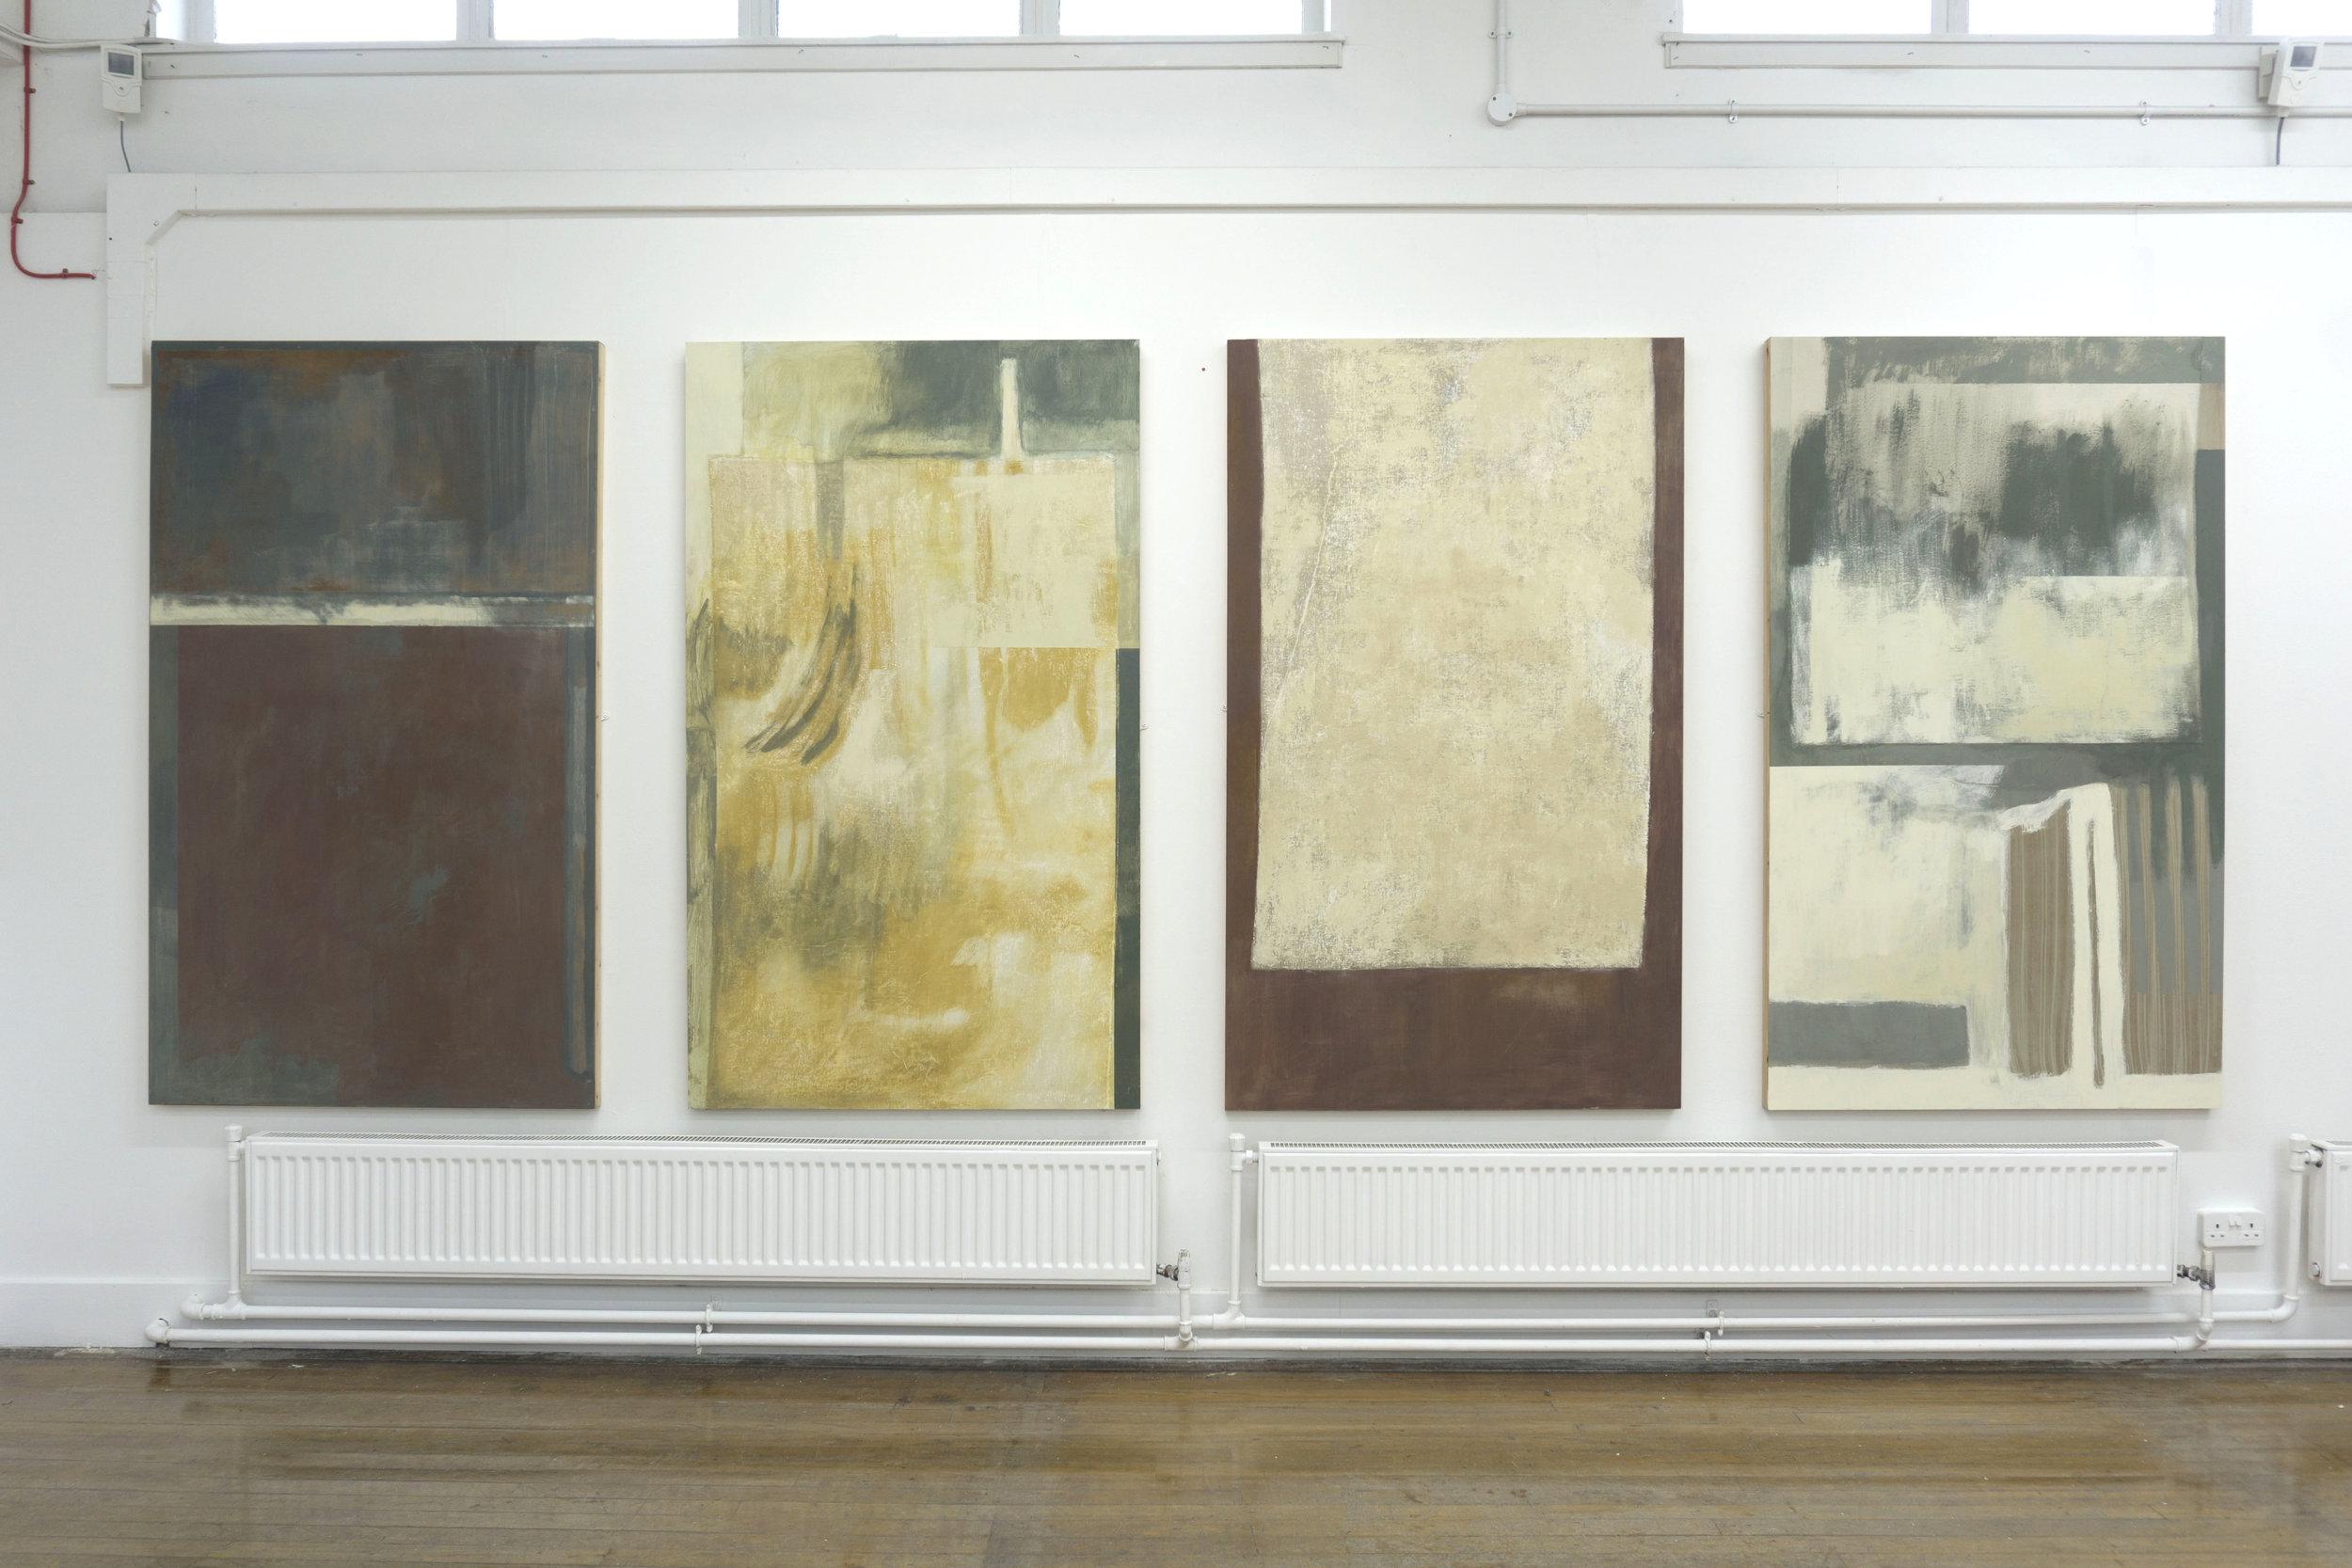 4x(100x170cm) Displayed in Duncan of Jordanstone college of art and design